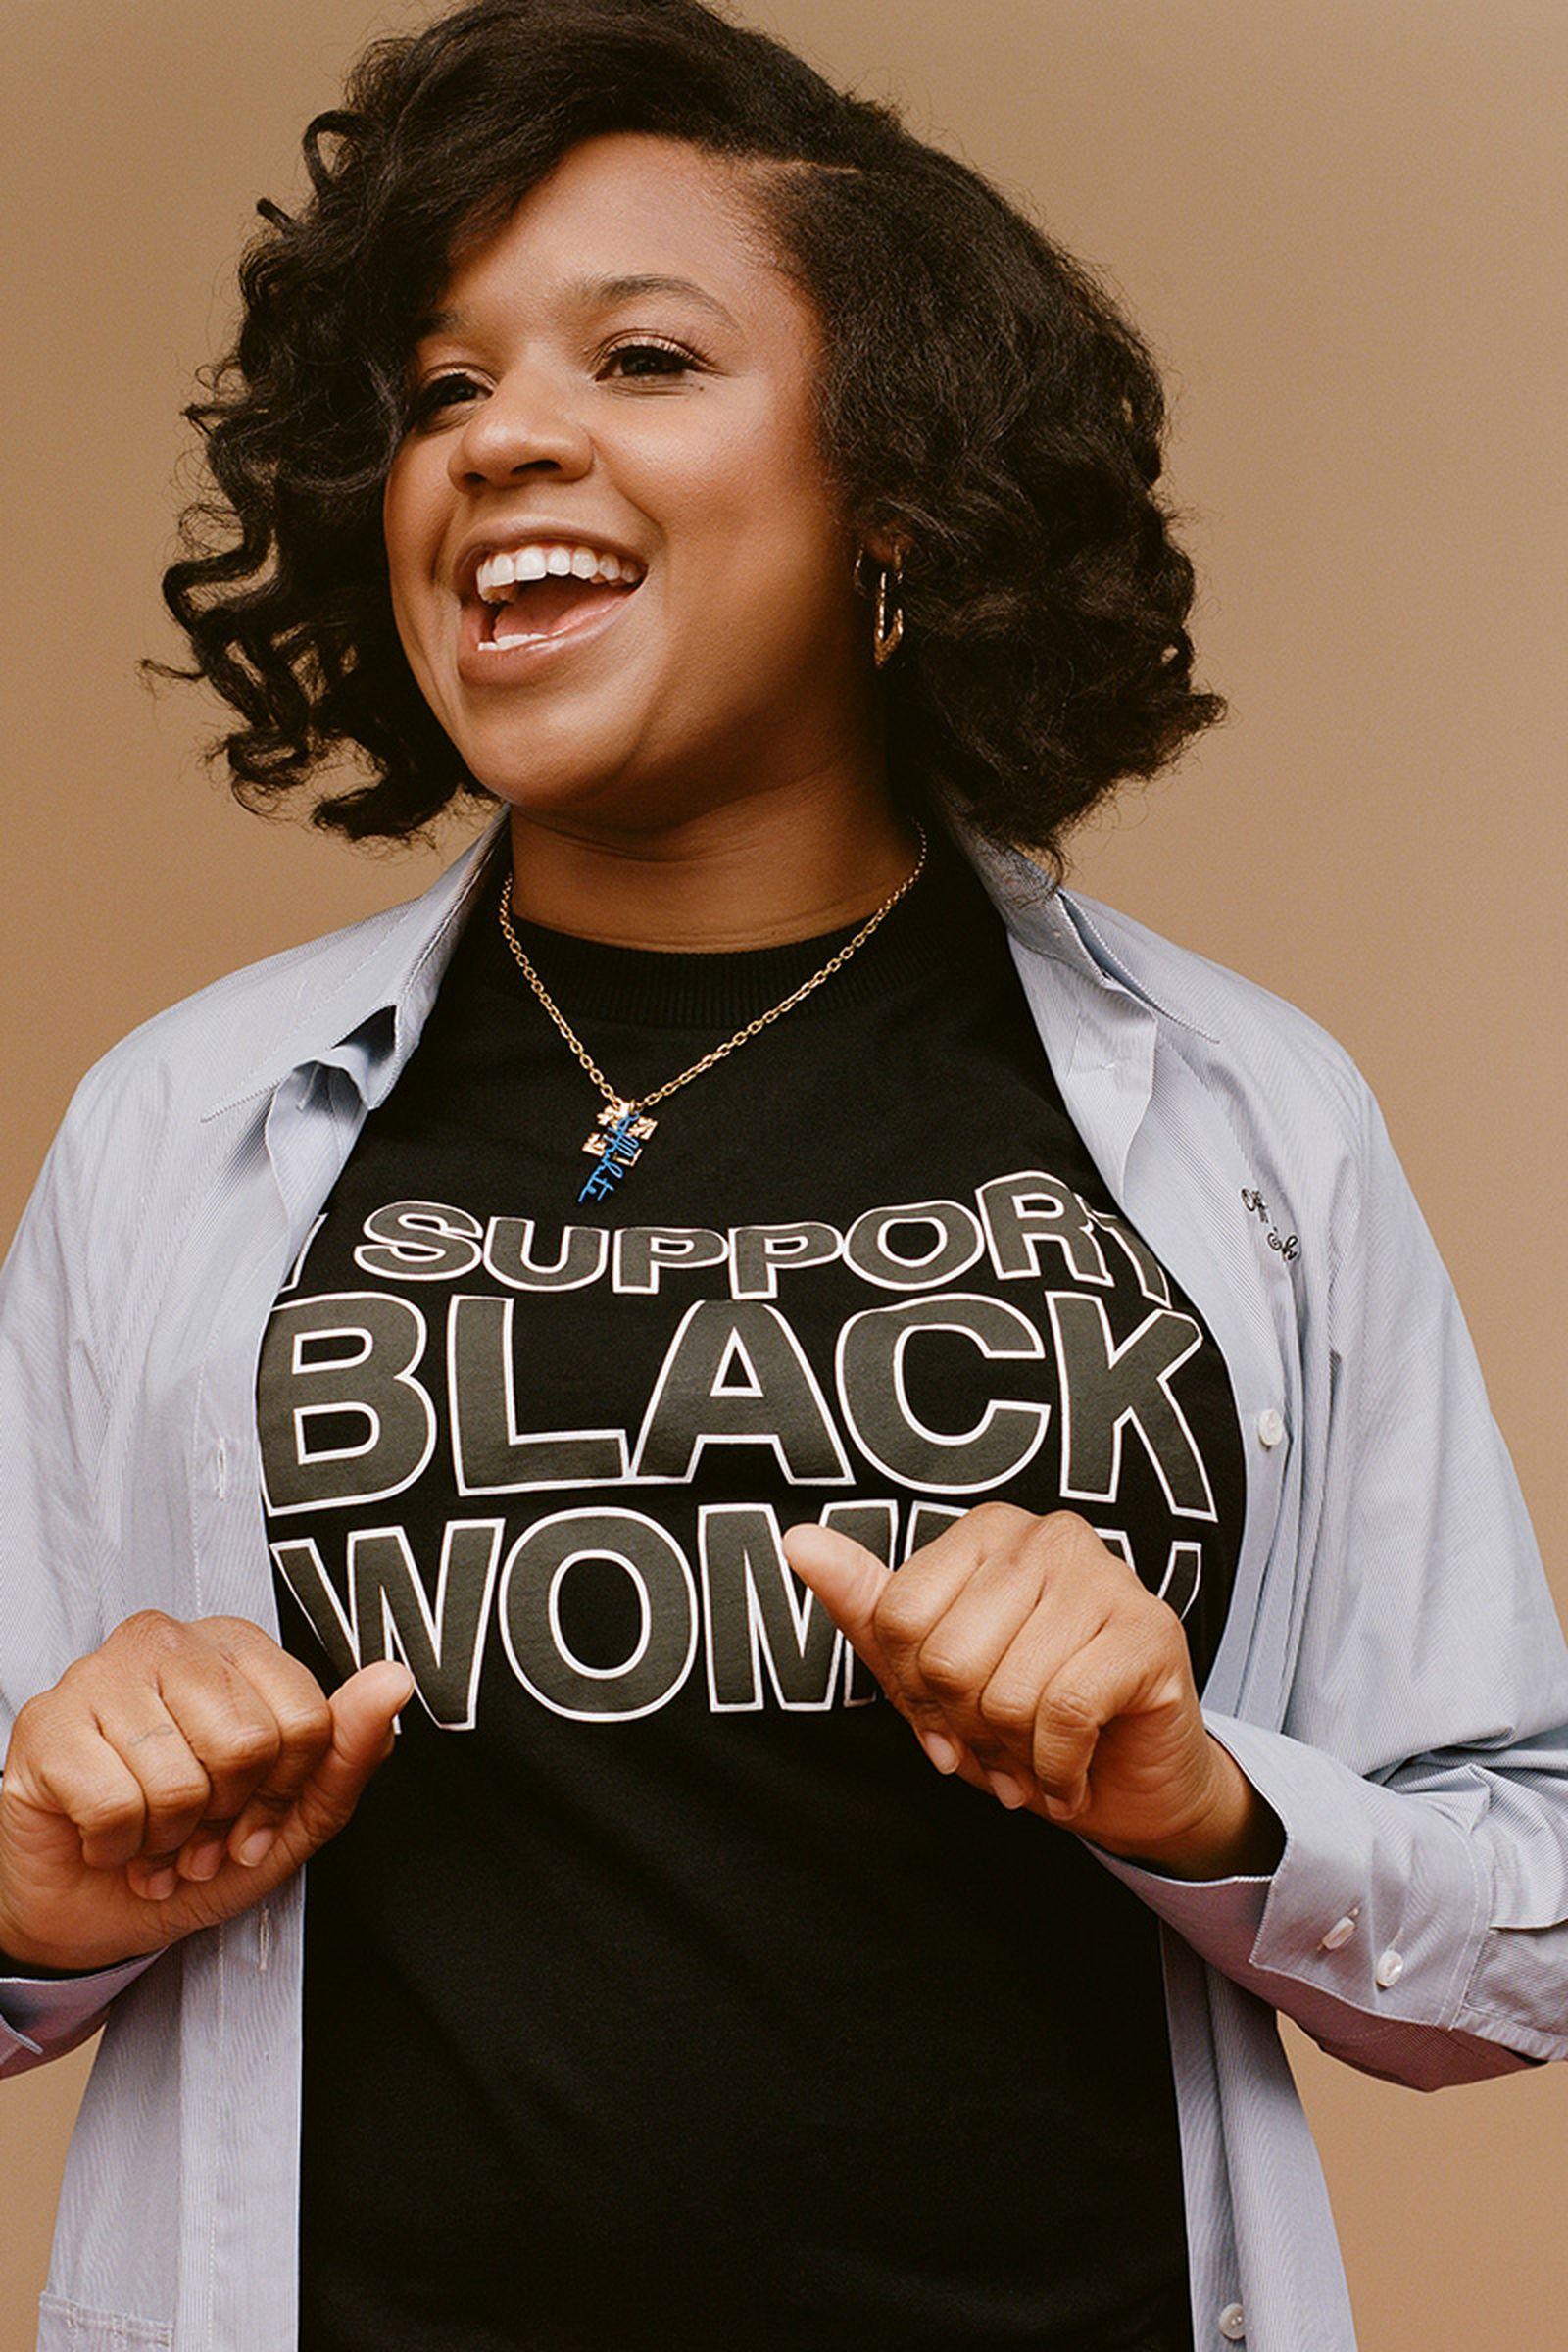 off-white-i-support-black-women-08